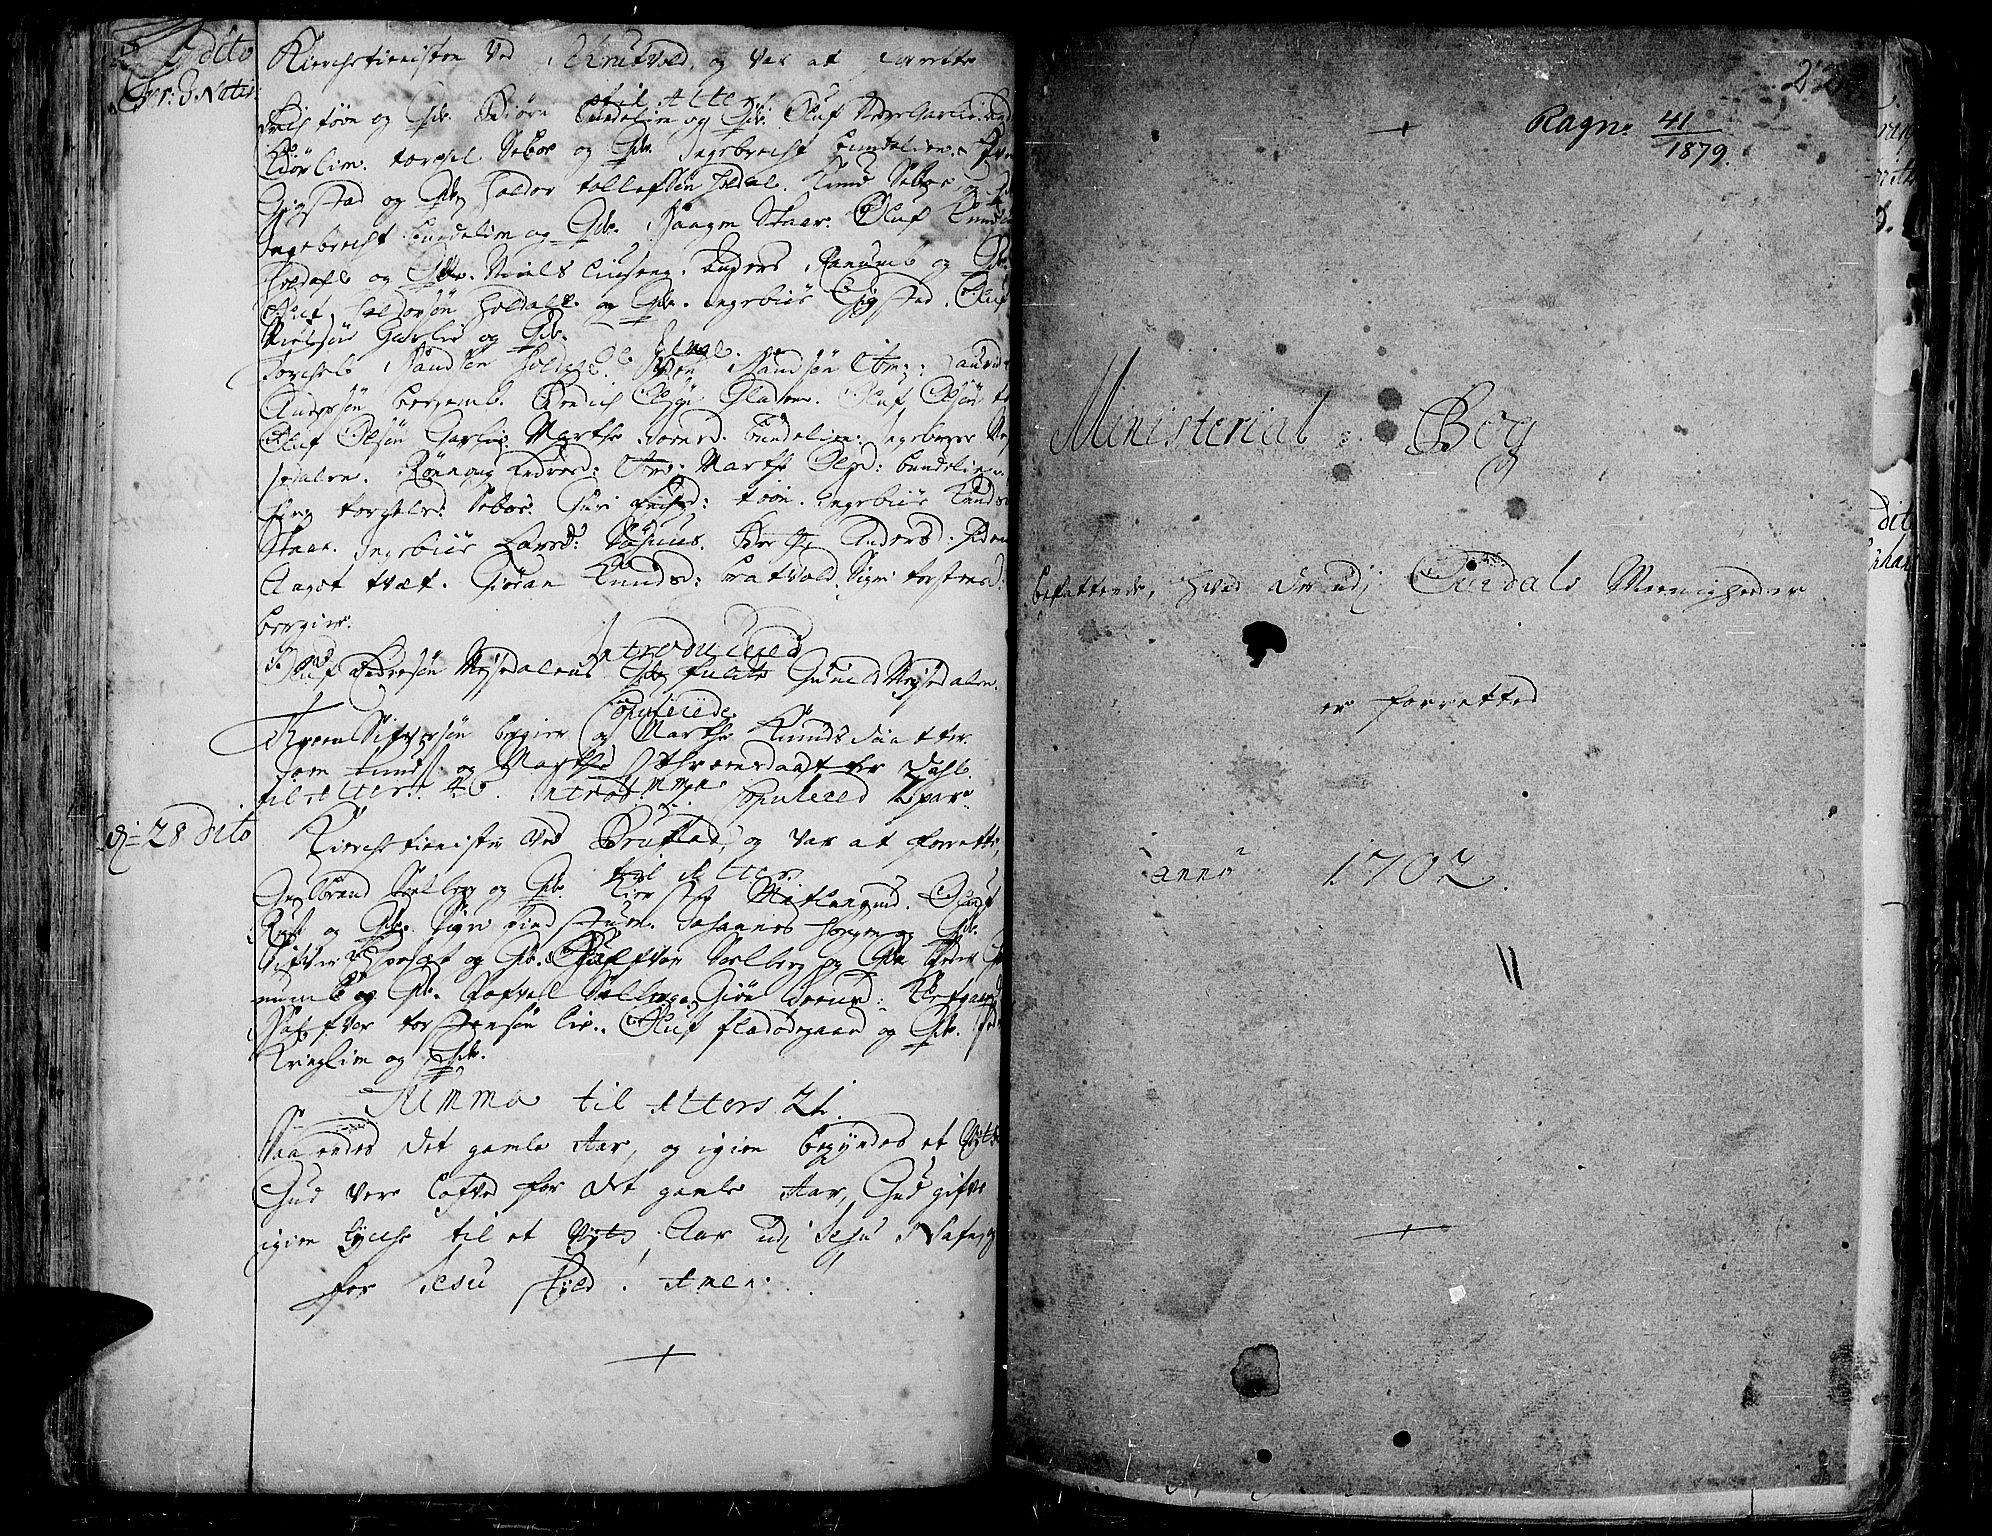 SAH, Aurdal prestekontor, Ministerialbok nr. 1-3, 1692-1730, s. 229